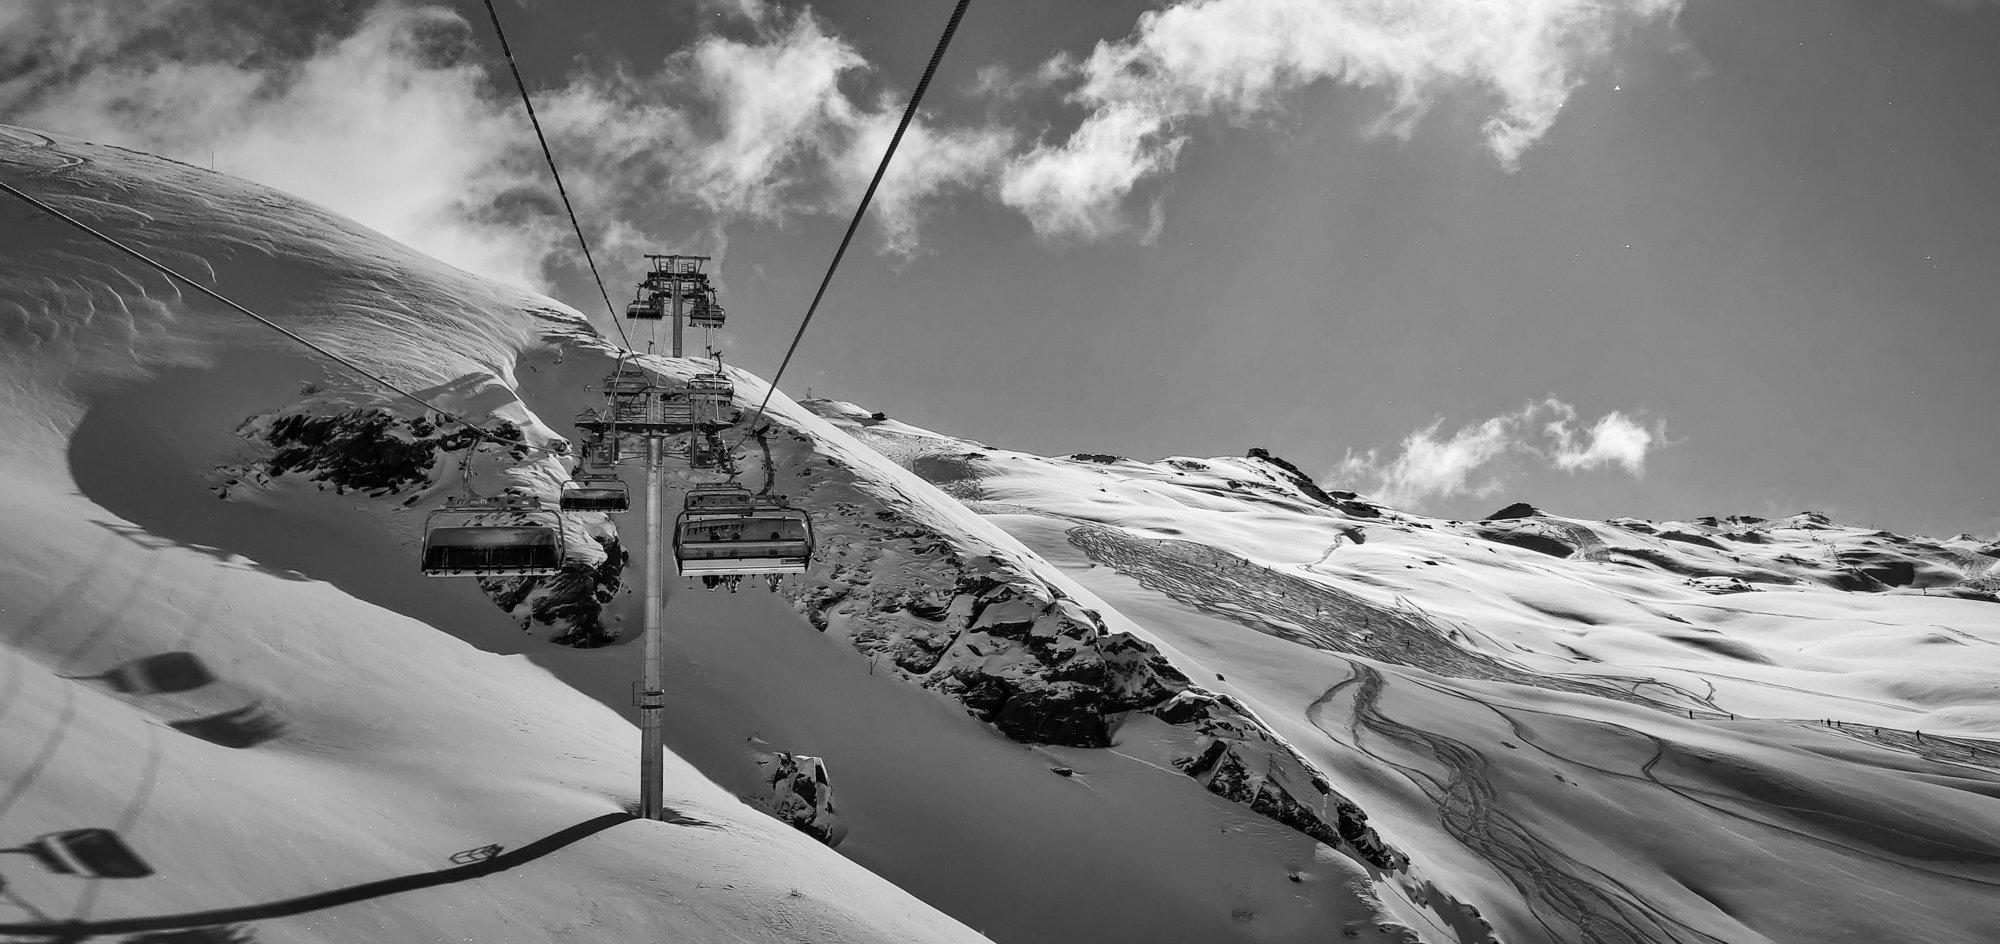 Powder skiing in March in Saint Martin, 3 Valleys